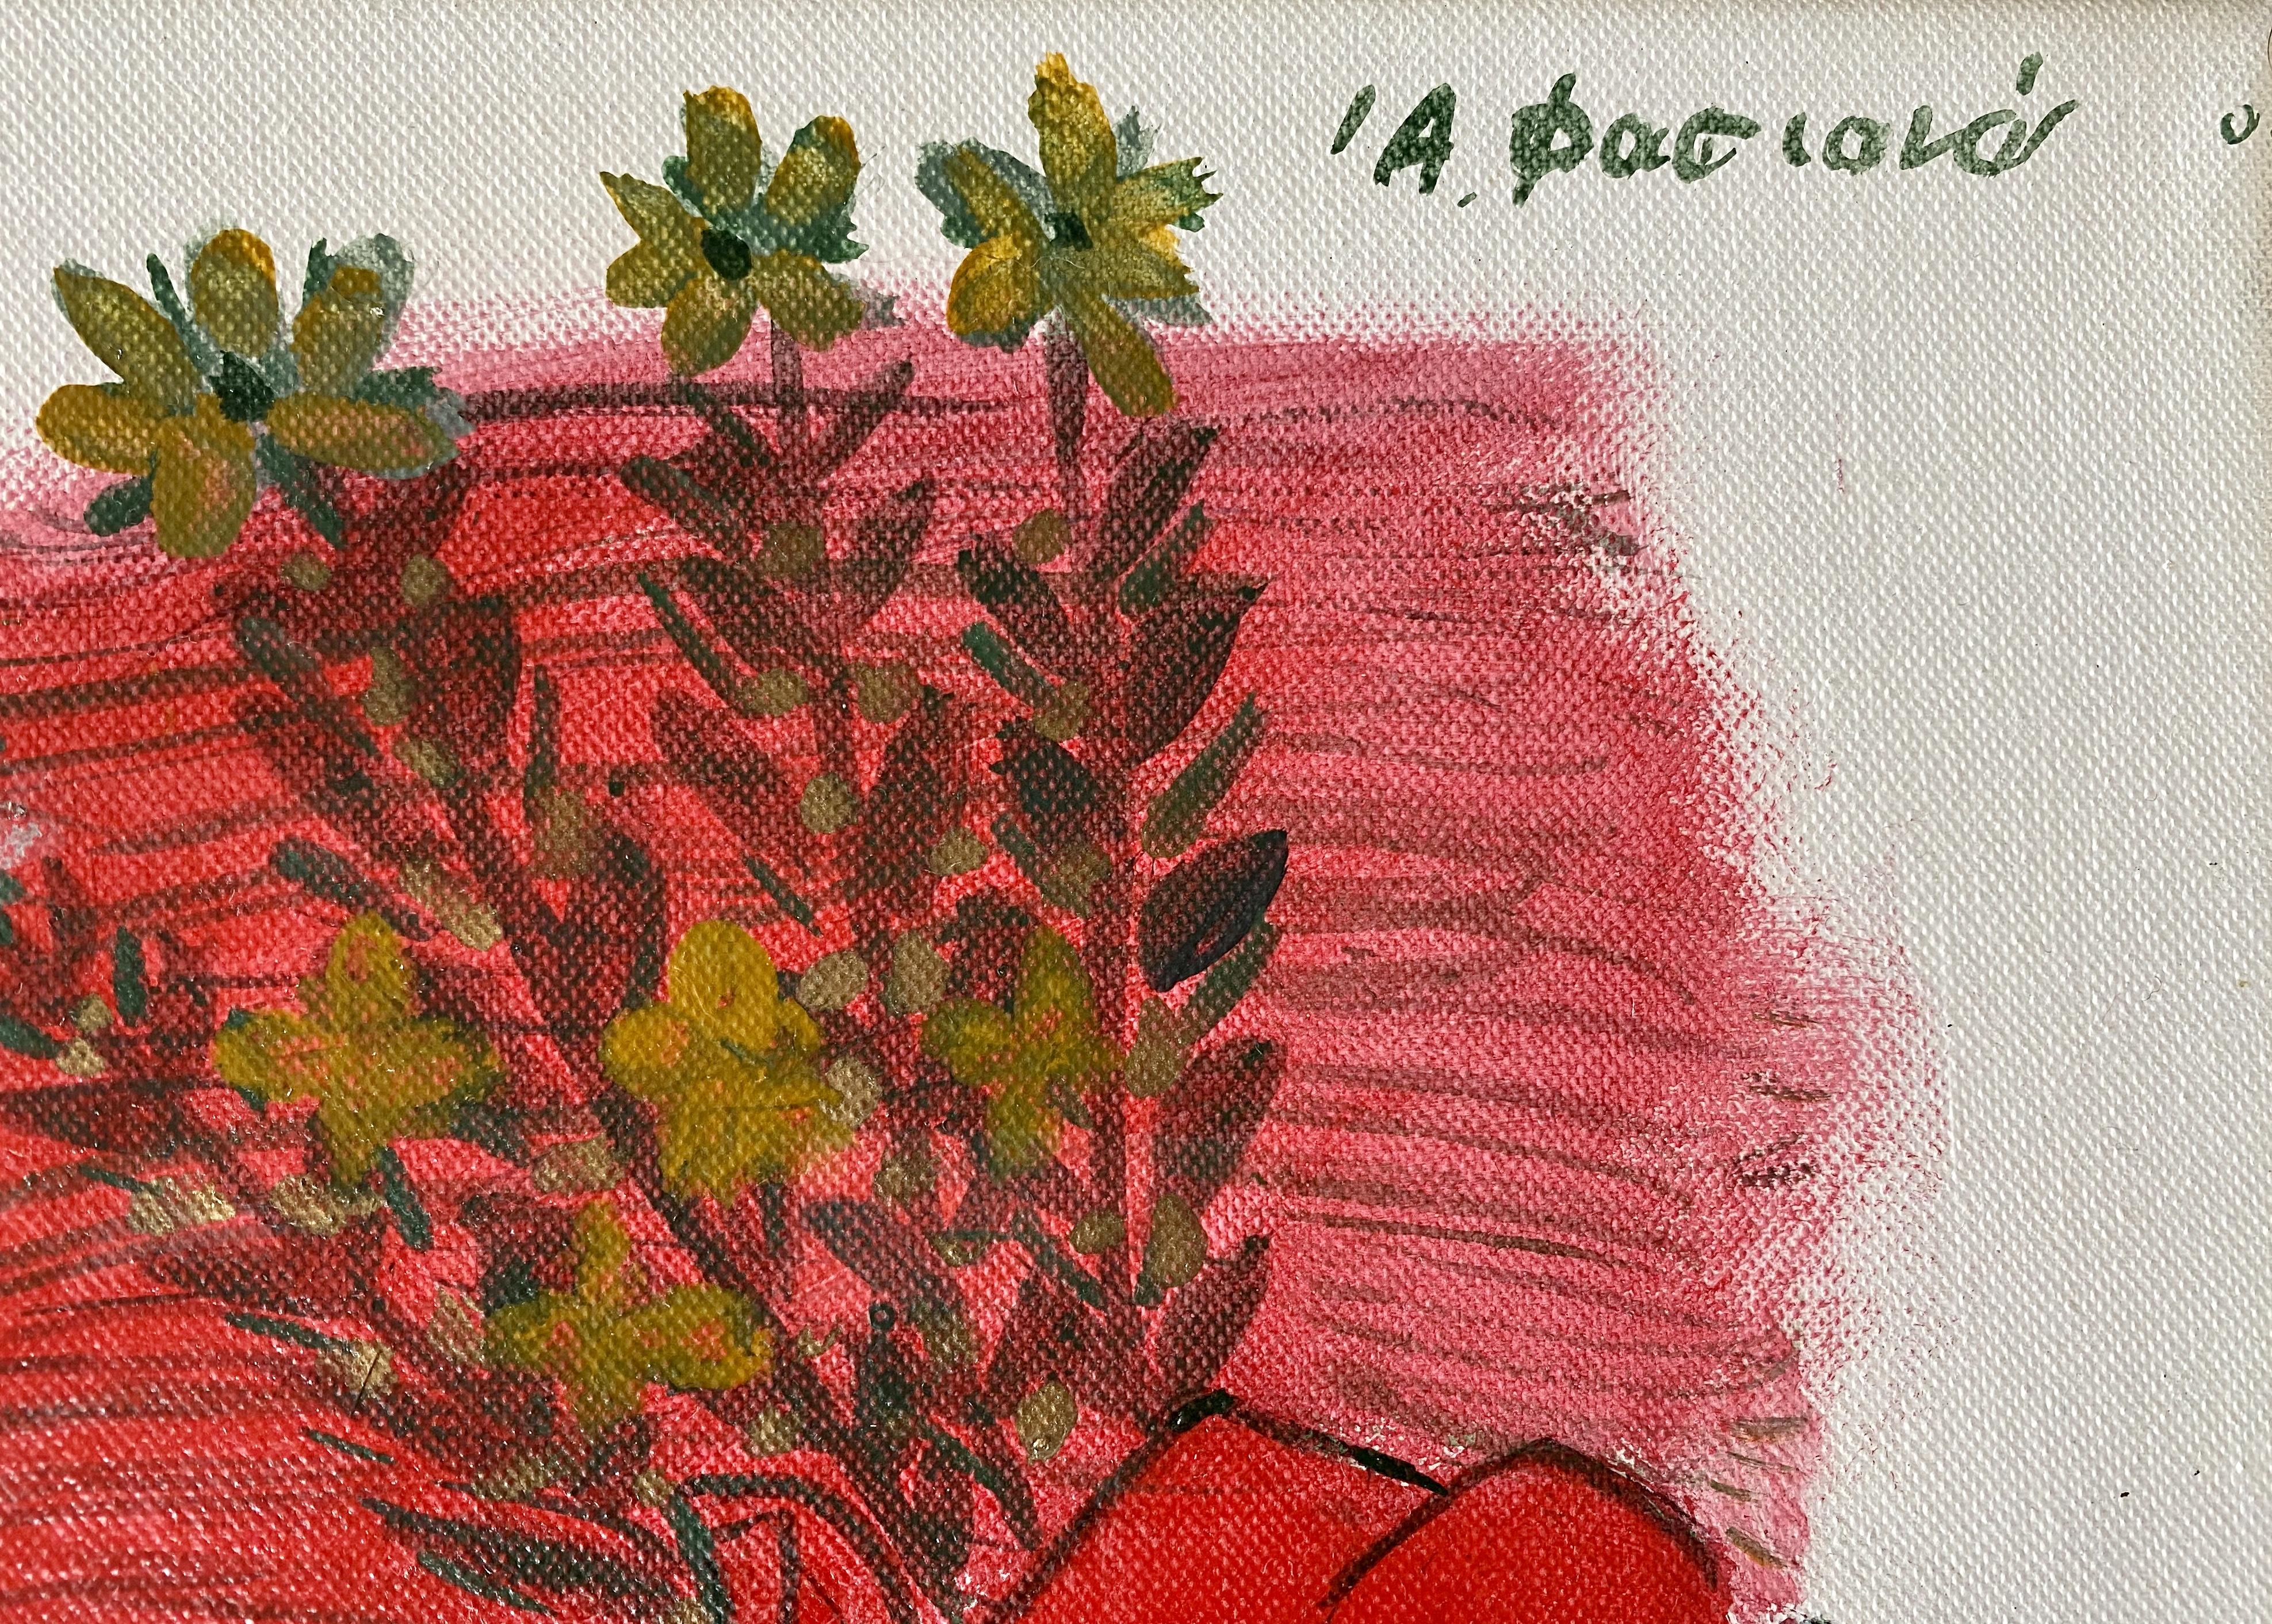 Alekos Fassianos (Greek, born 1935) (AR), The Cyclist's Rendezvous, 74 x 49 cm - Image 2 of 3